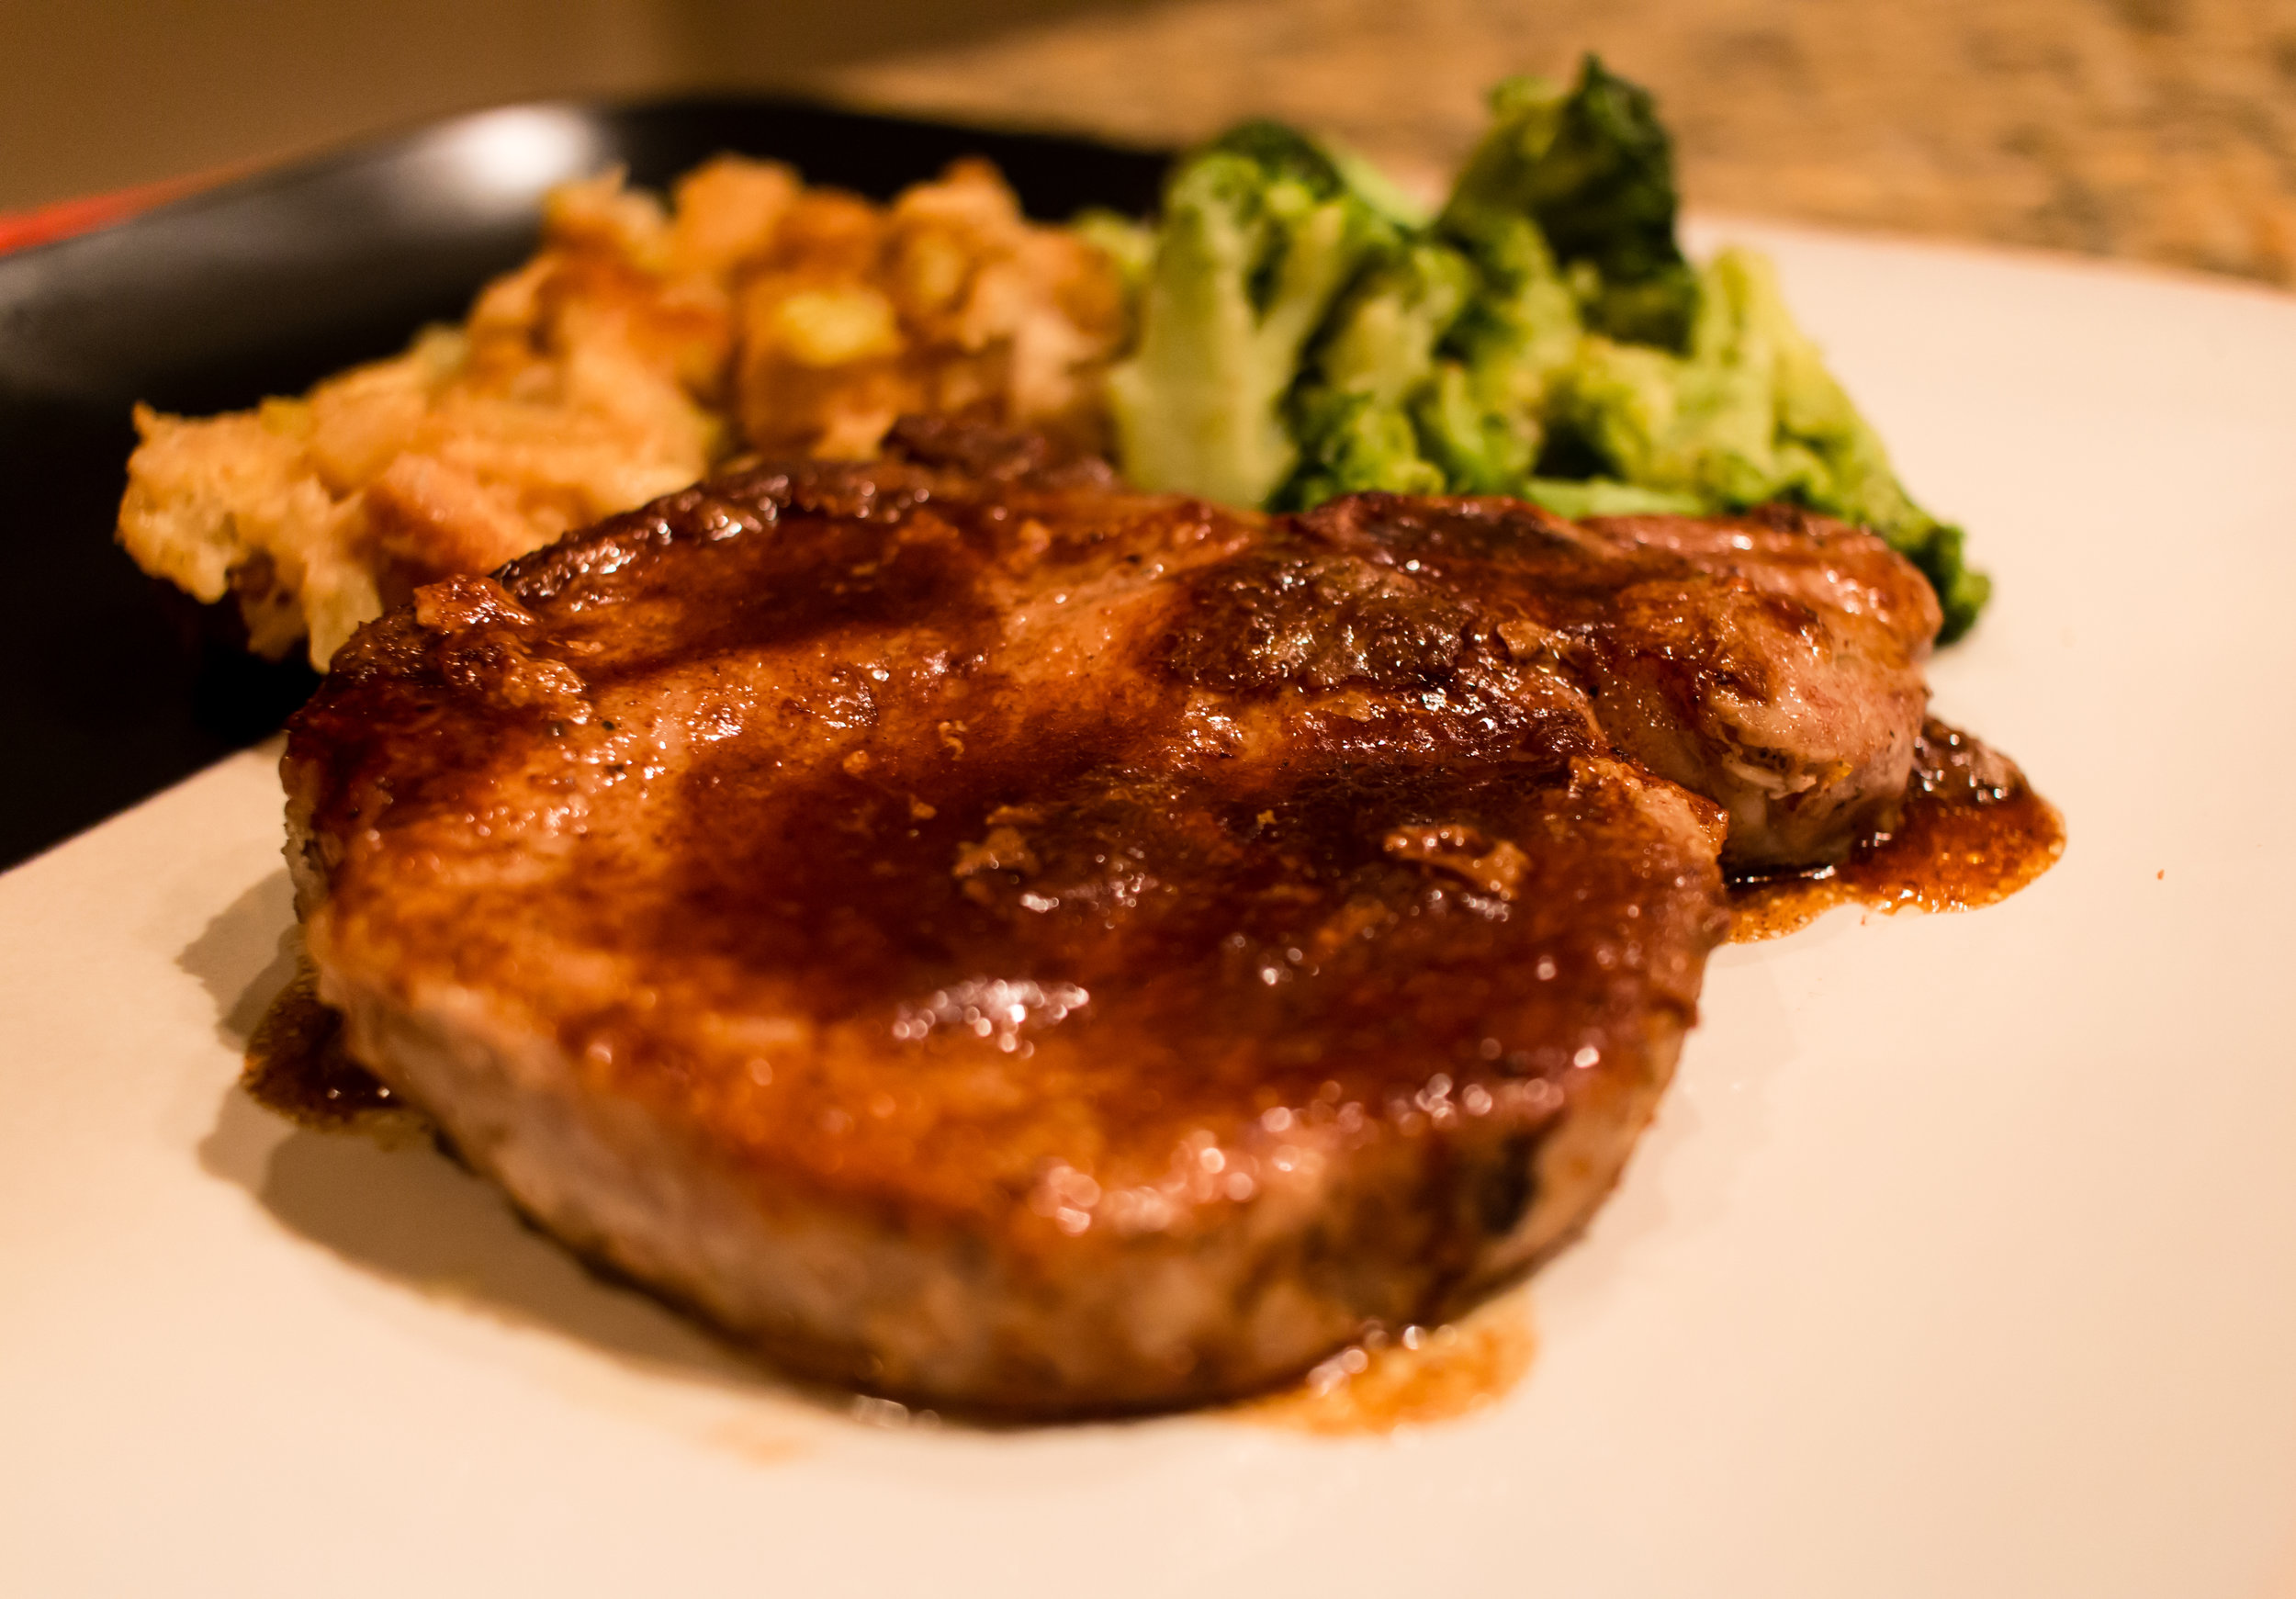 home-chef-recipe-cinnamon-pork-chop